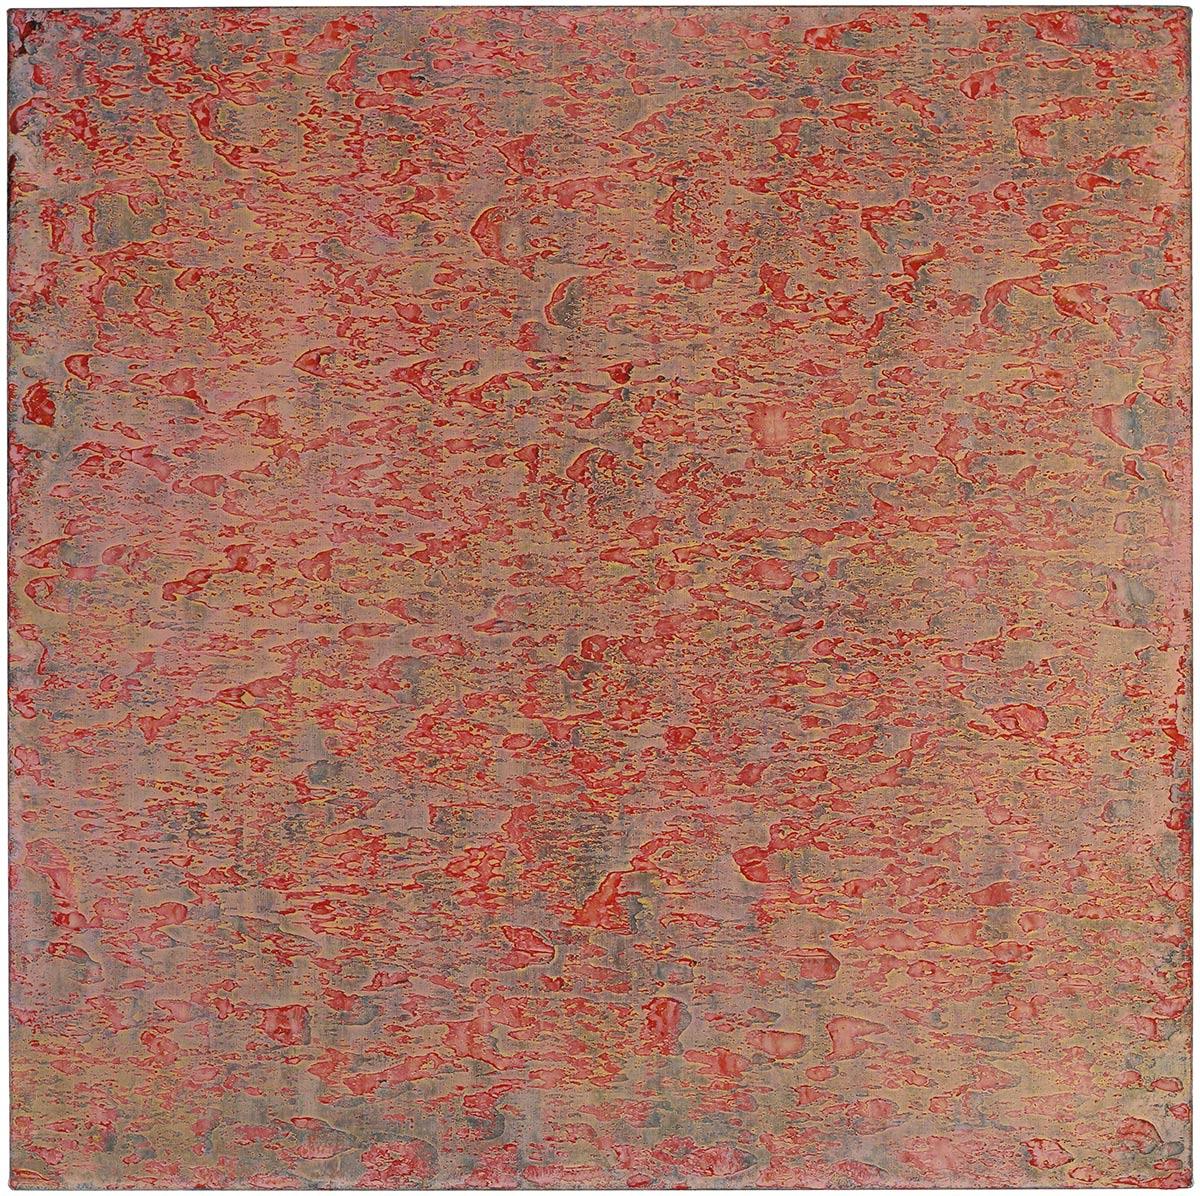 Michael Kravagna | Oil Tempera Pigments on Canvas 2018 | 2. Turn | Galerie3 Velden